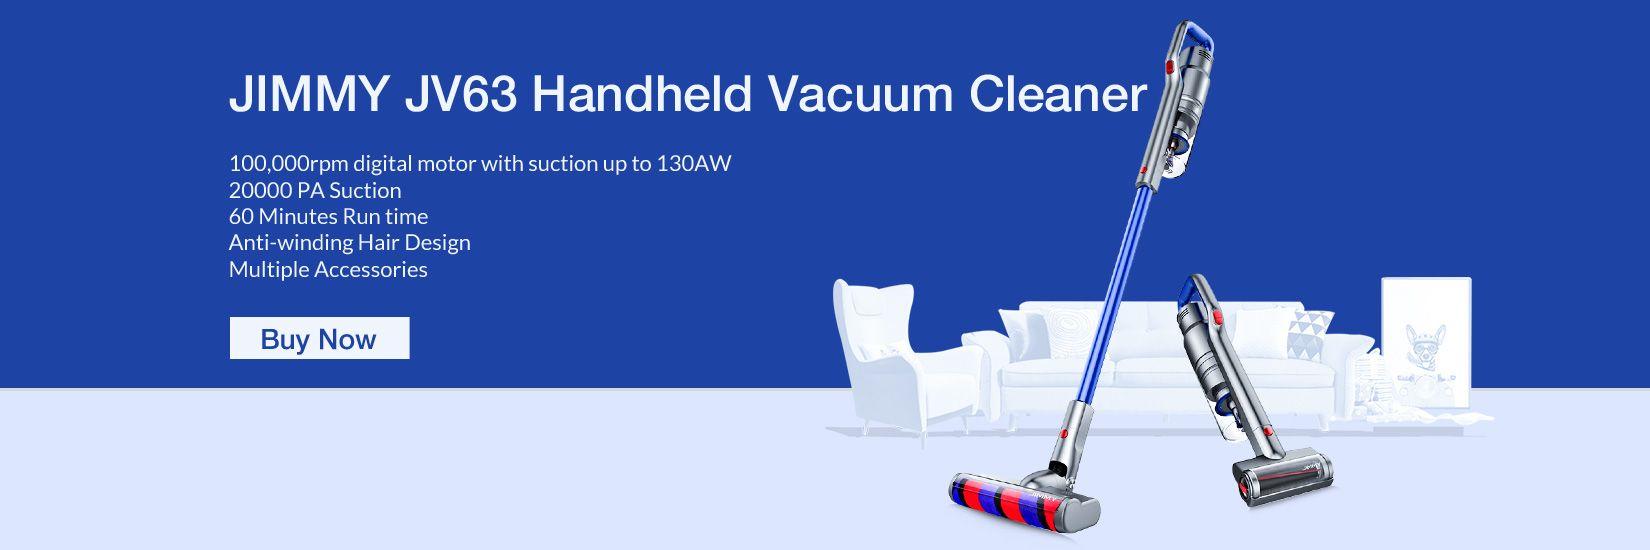 JIMMY JV63 Handheld Cordless Stick Vacuum Cleaner - Geekbuying.pl